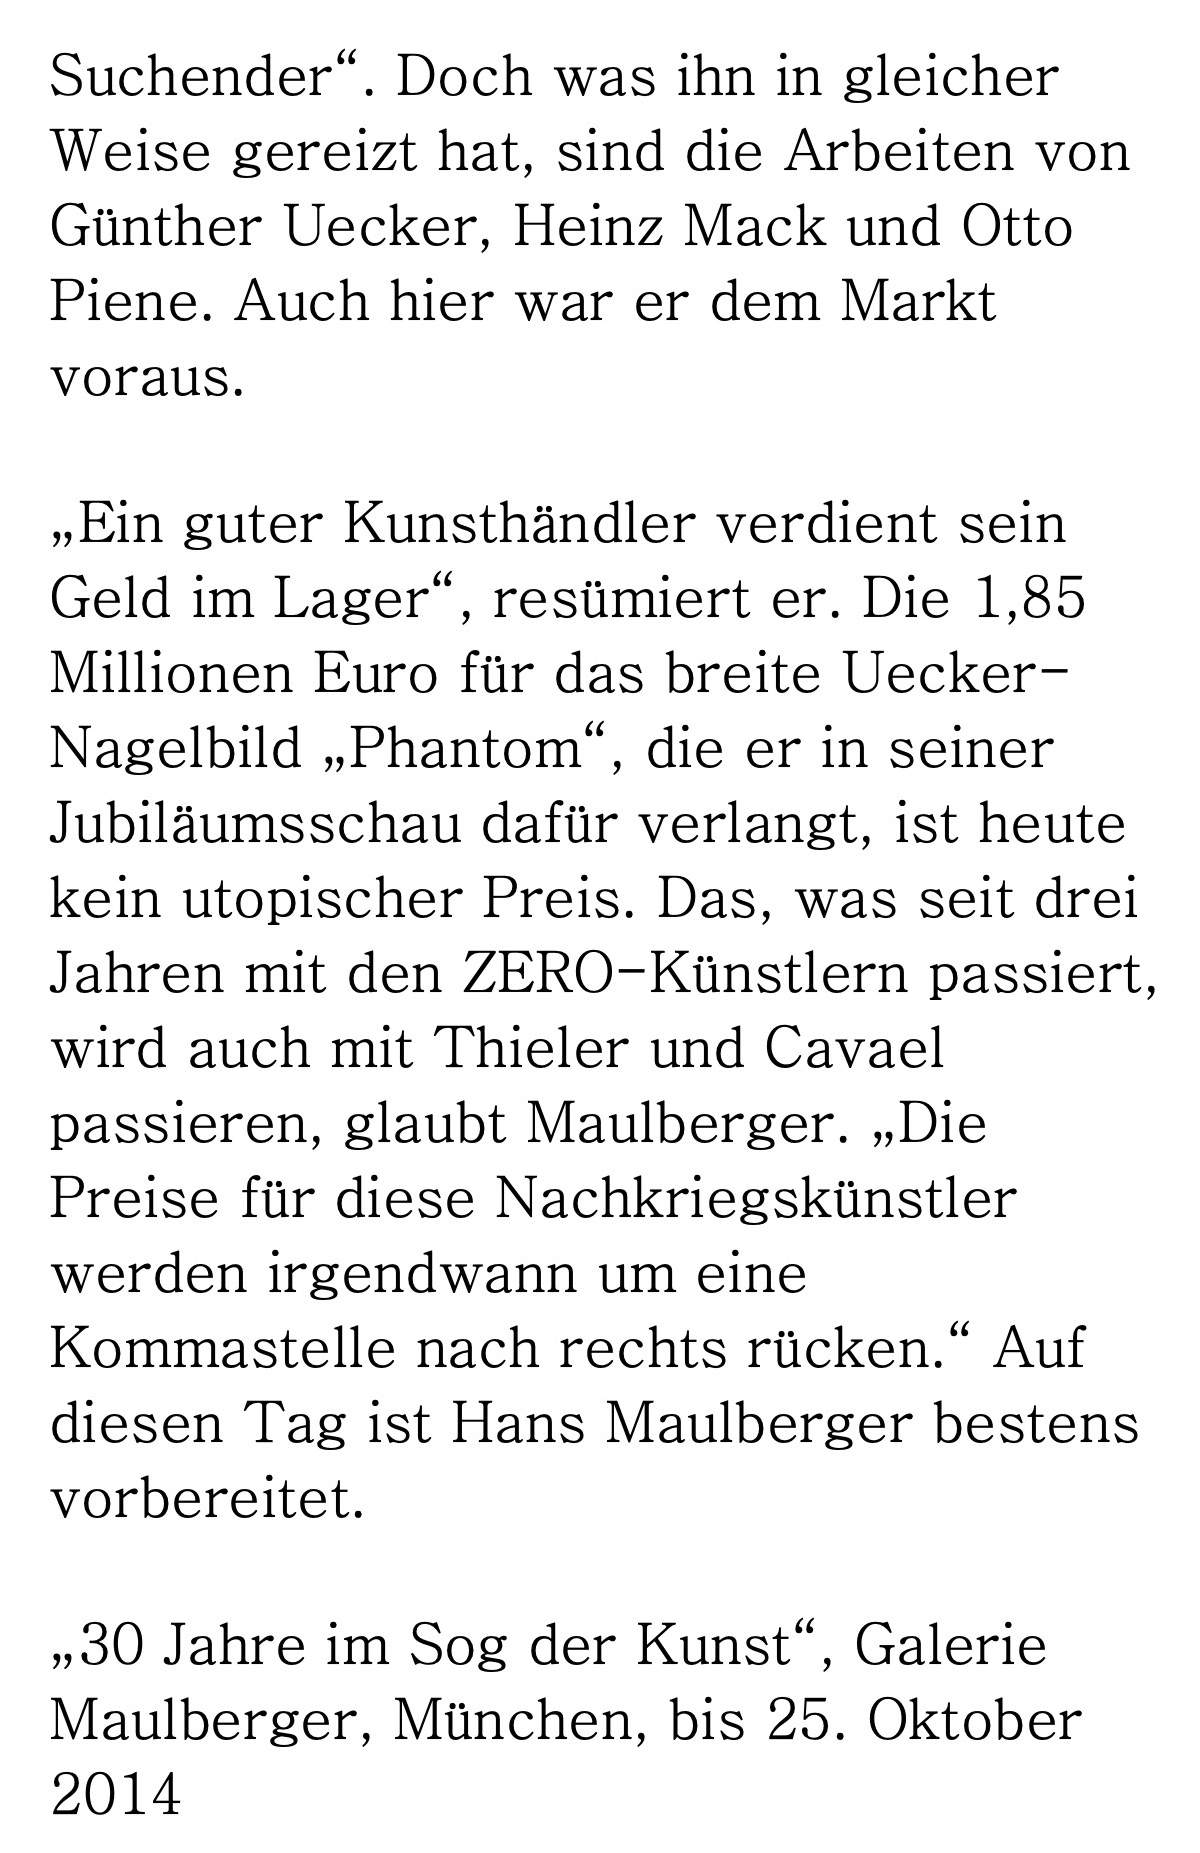 Presse Galerie Maulberger Handelsblatt 2014 05